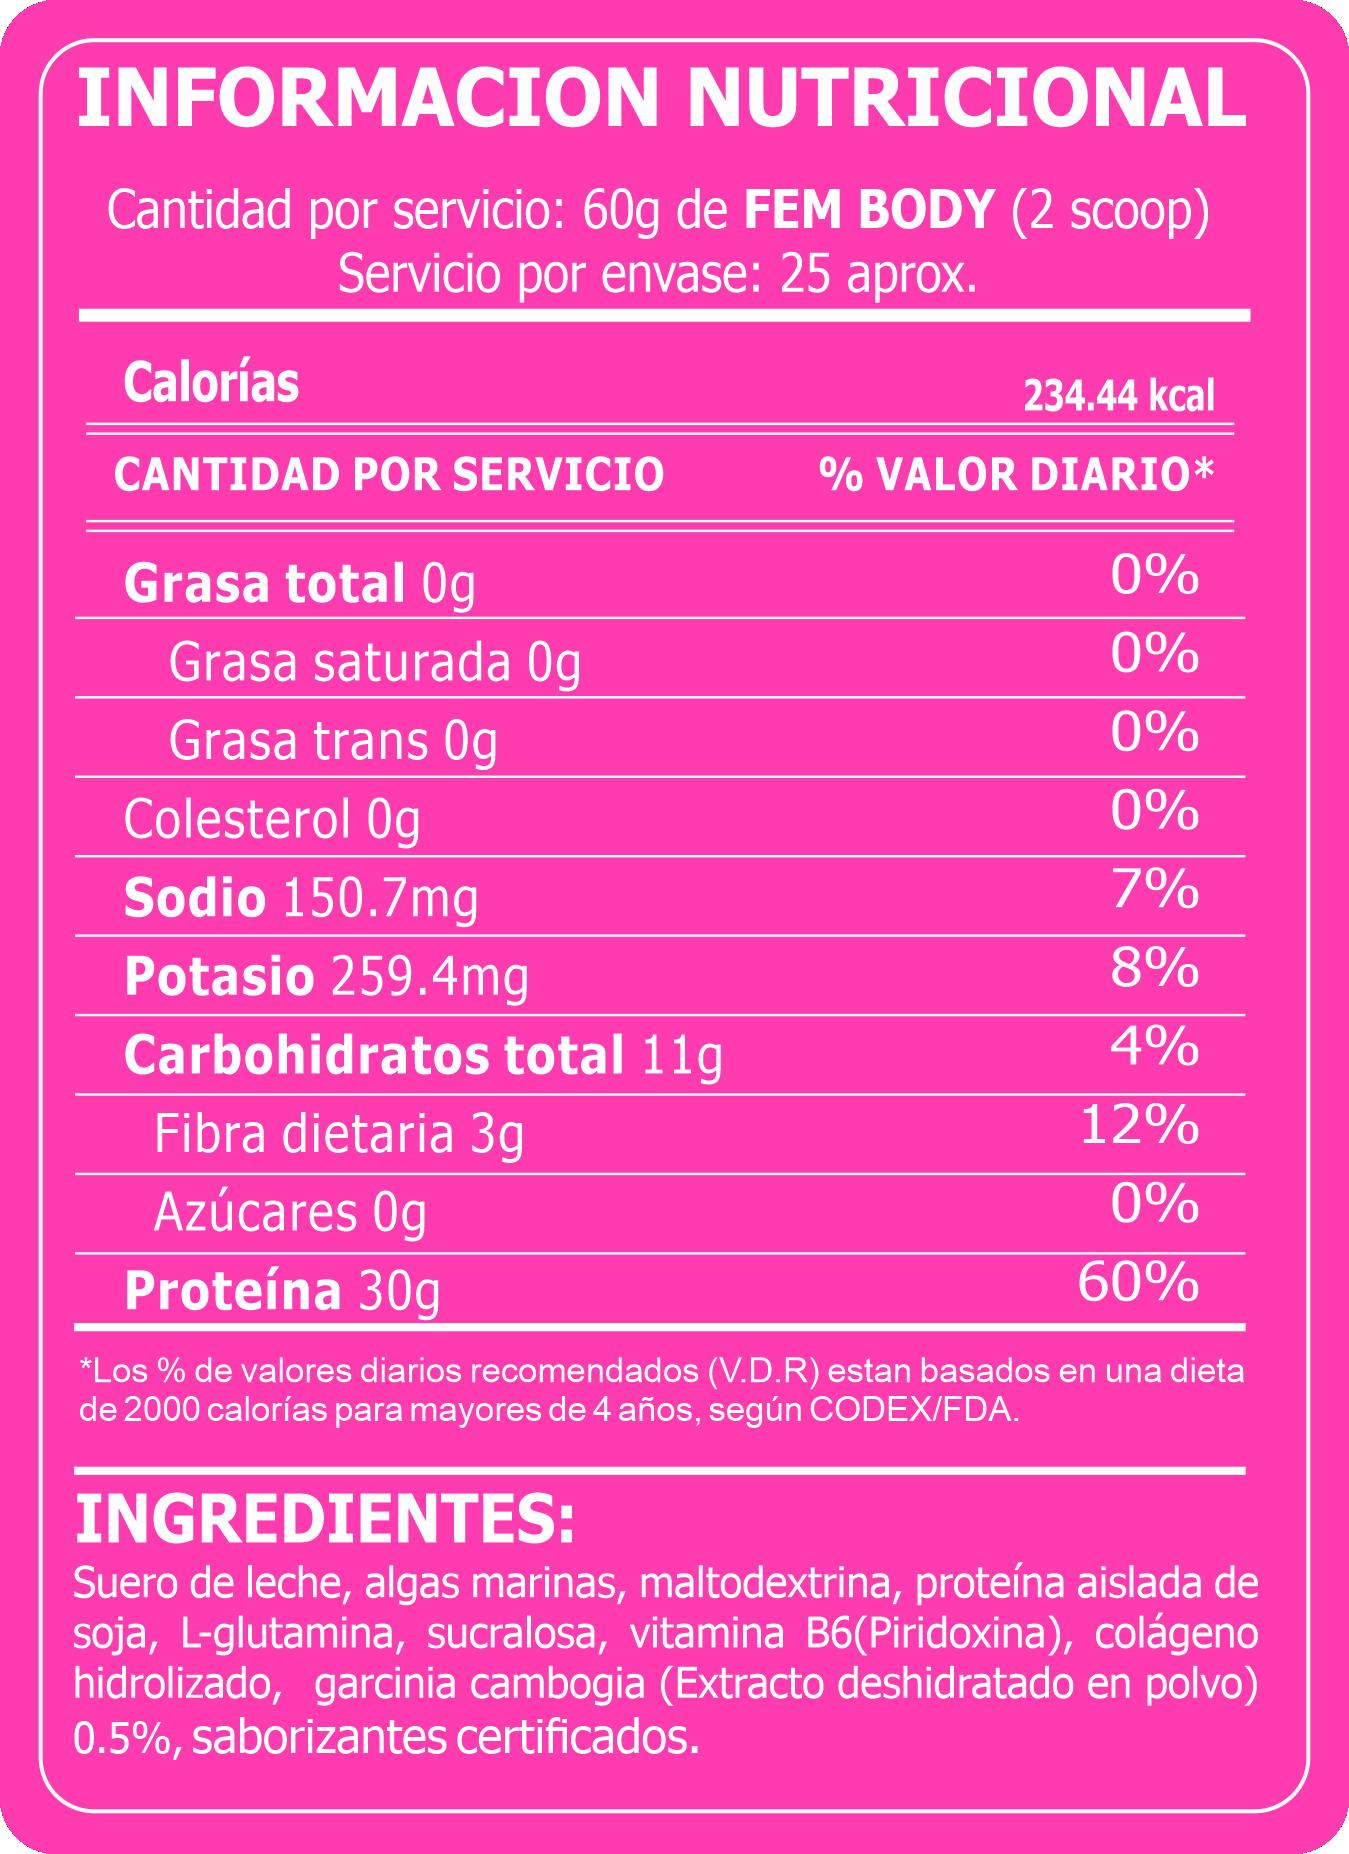 Tabla Nutricional FEM BODY